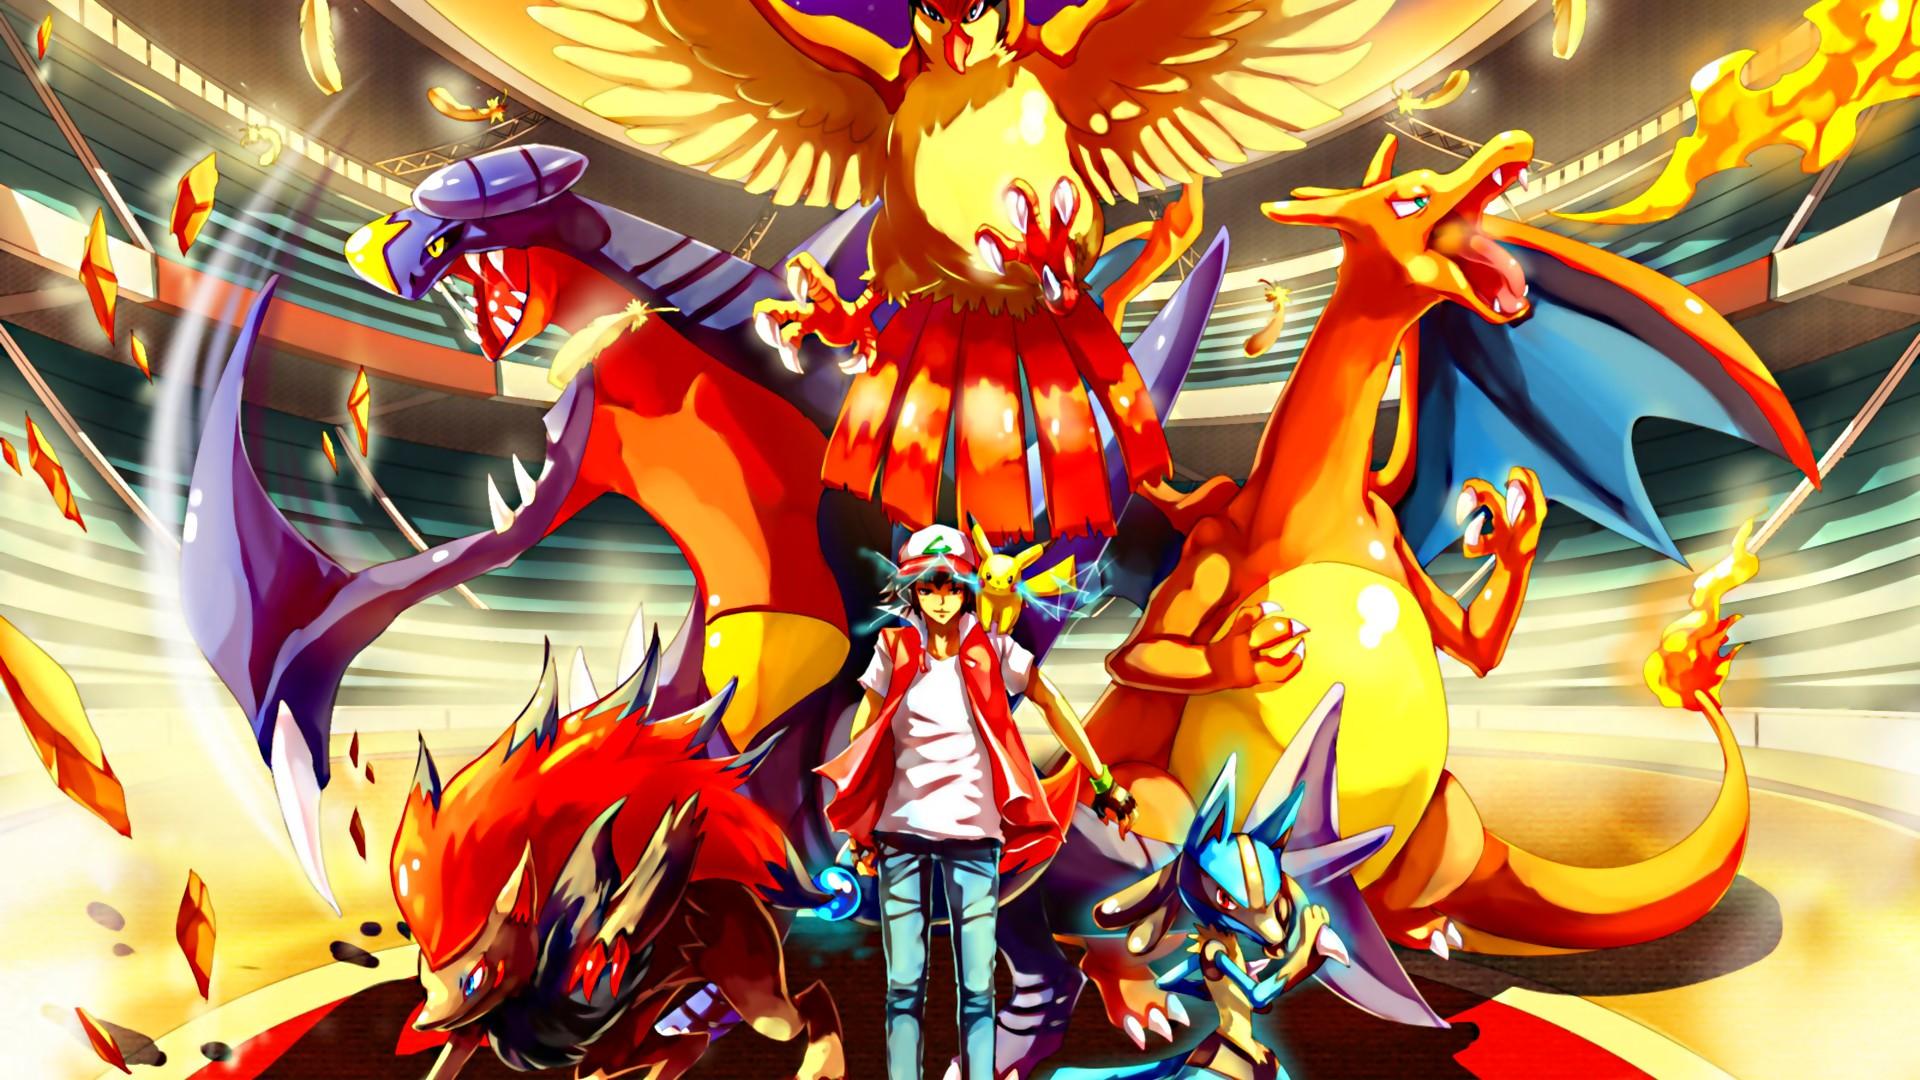 Pokemon HD Wallpaper ·① Download Free Awesome High